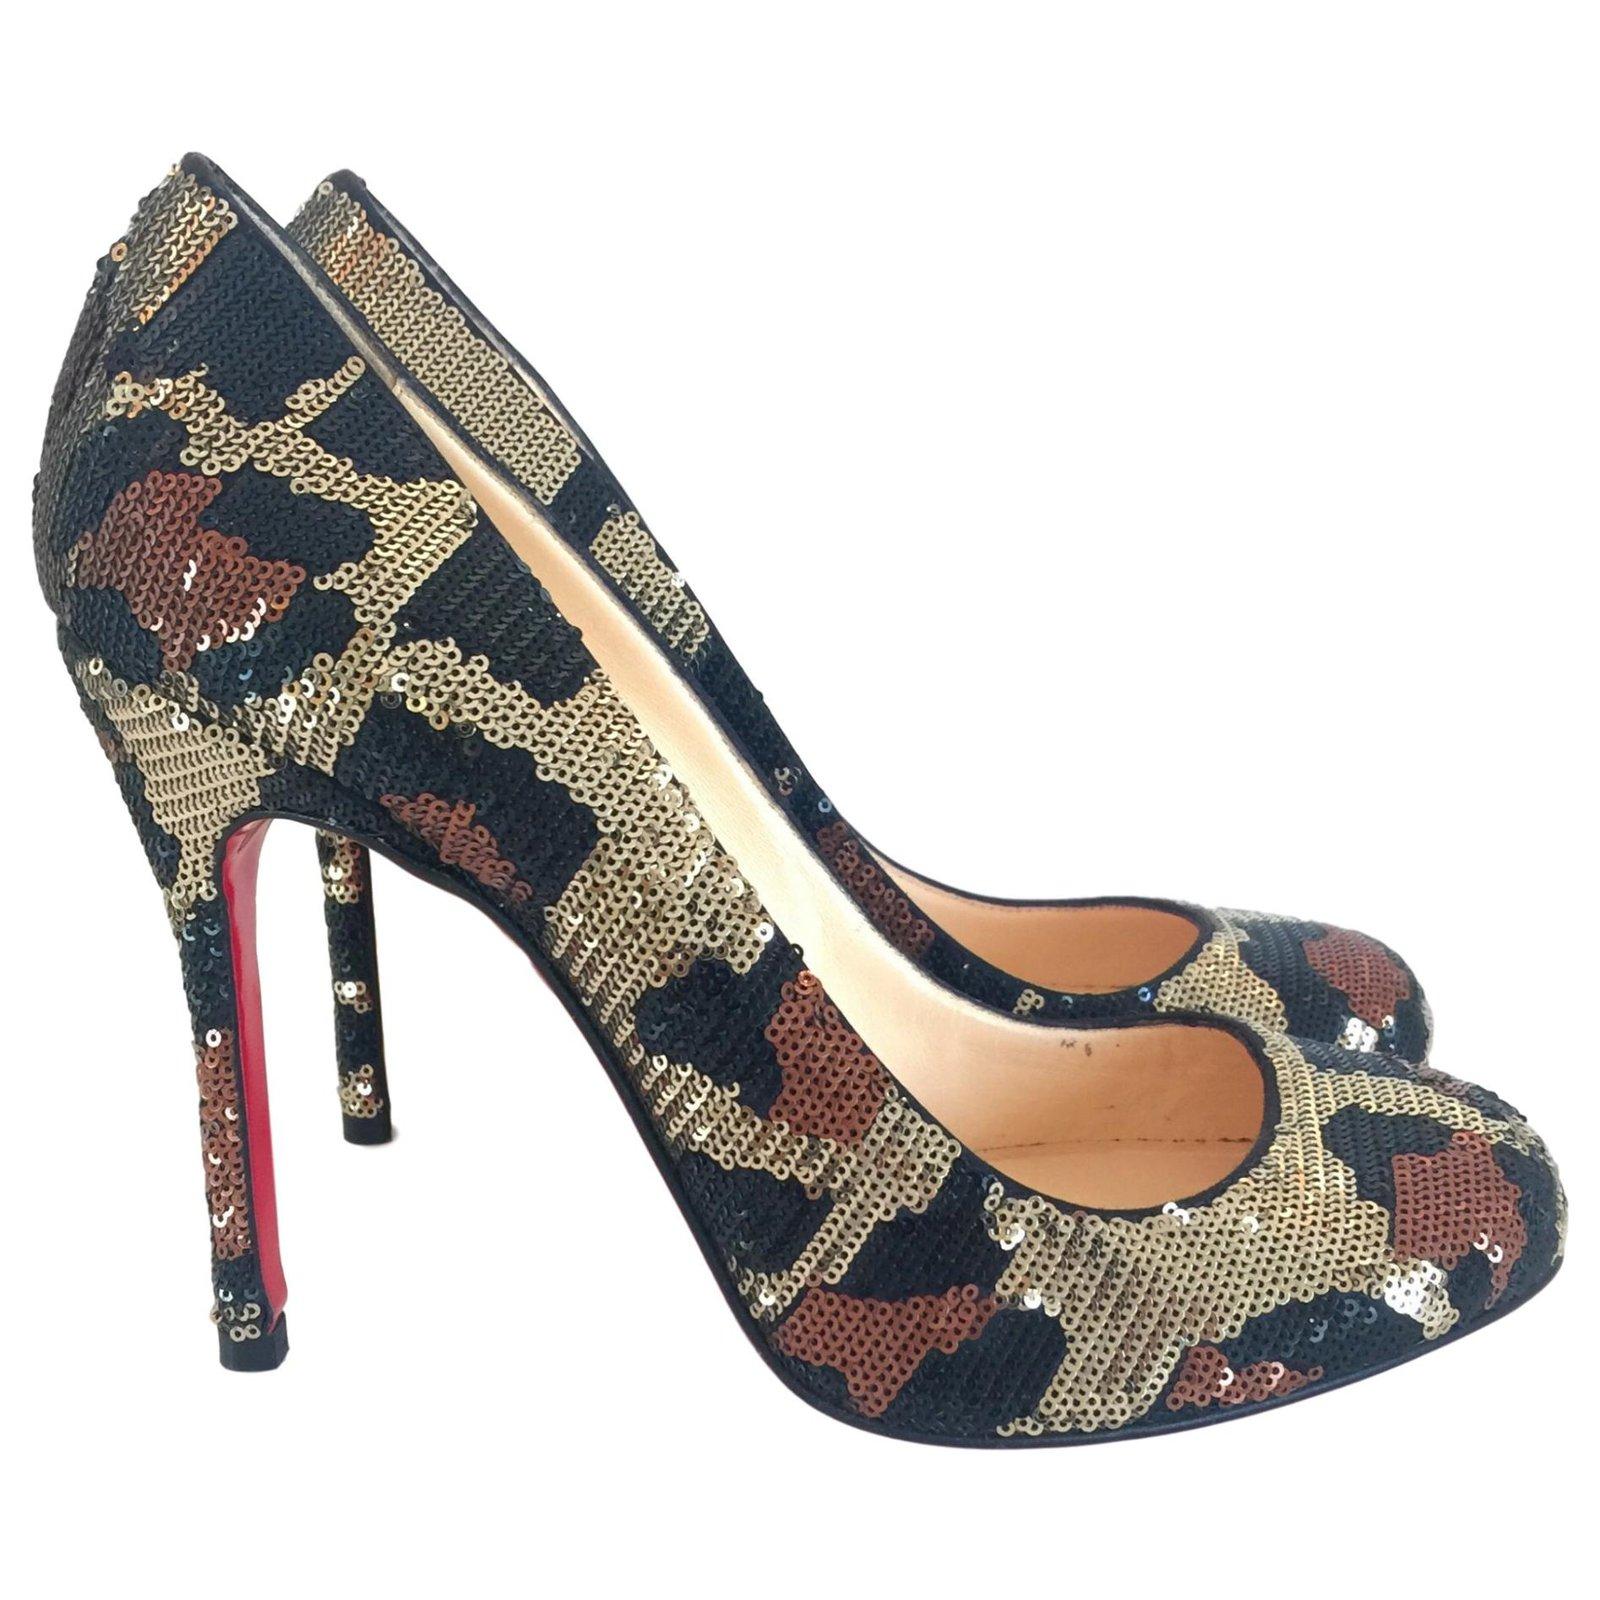 68b31fcf6a5e Christian Louboutin Heels Heels Leather Metallic ref.125633 - Joli Closet